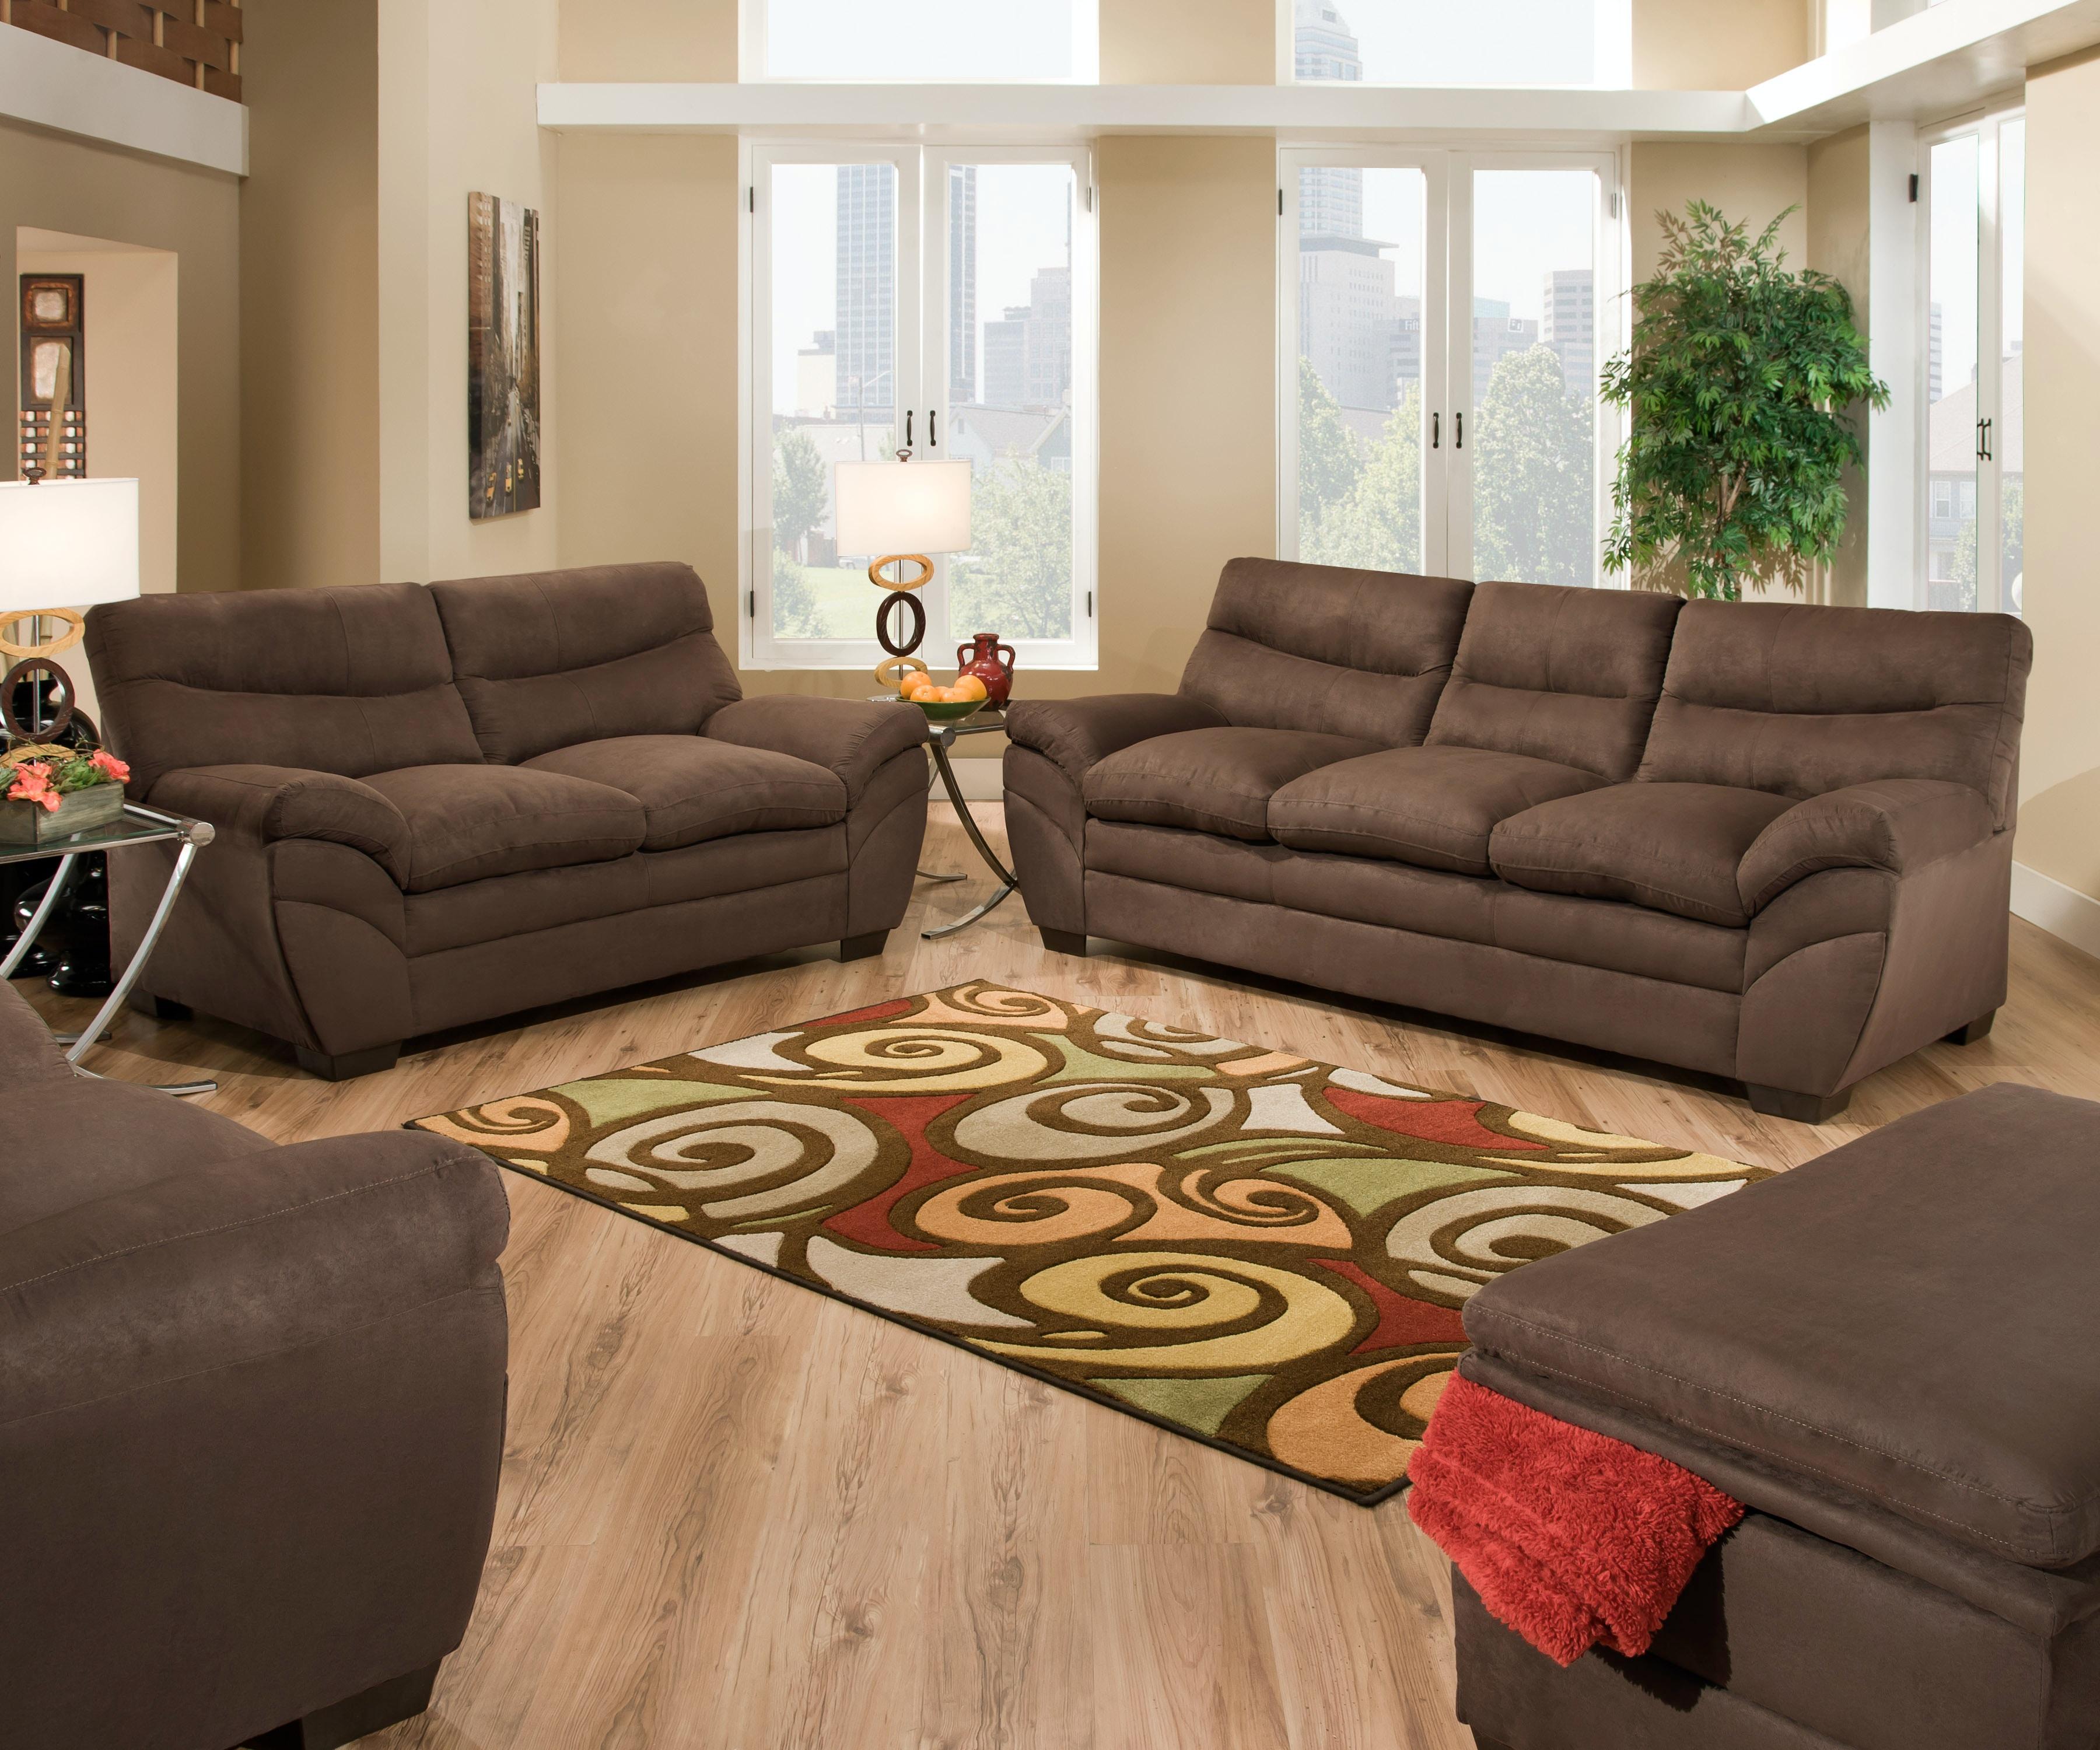 ... Simmons Luna Sofa By Simmons Upholstery Amp Casegoods Living Room 9515  Sofa ...